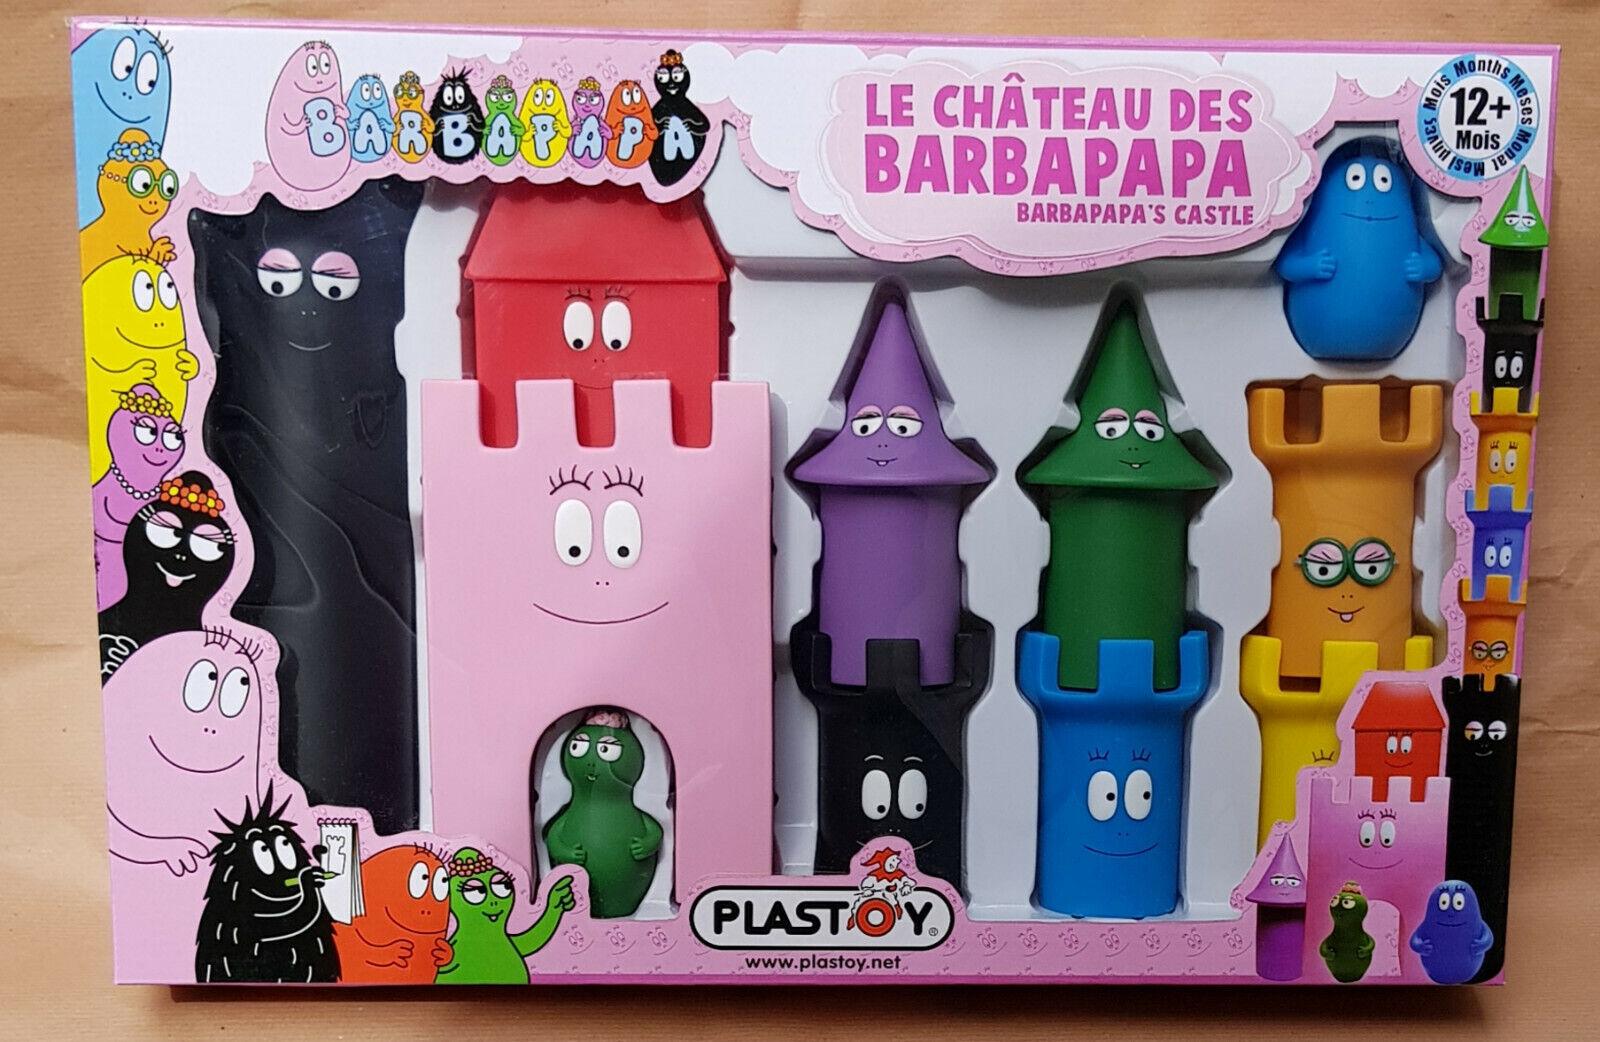 PLASTOY 60821-BARBAPAPA CASTELLO in gomma - 9 9 9 PZ - da 12 mesi  salida